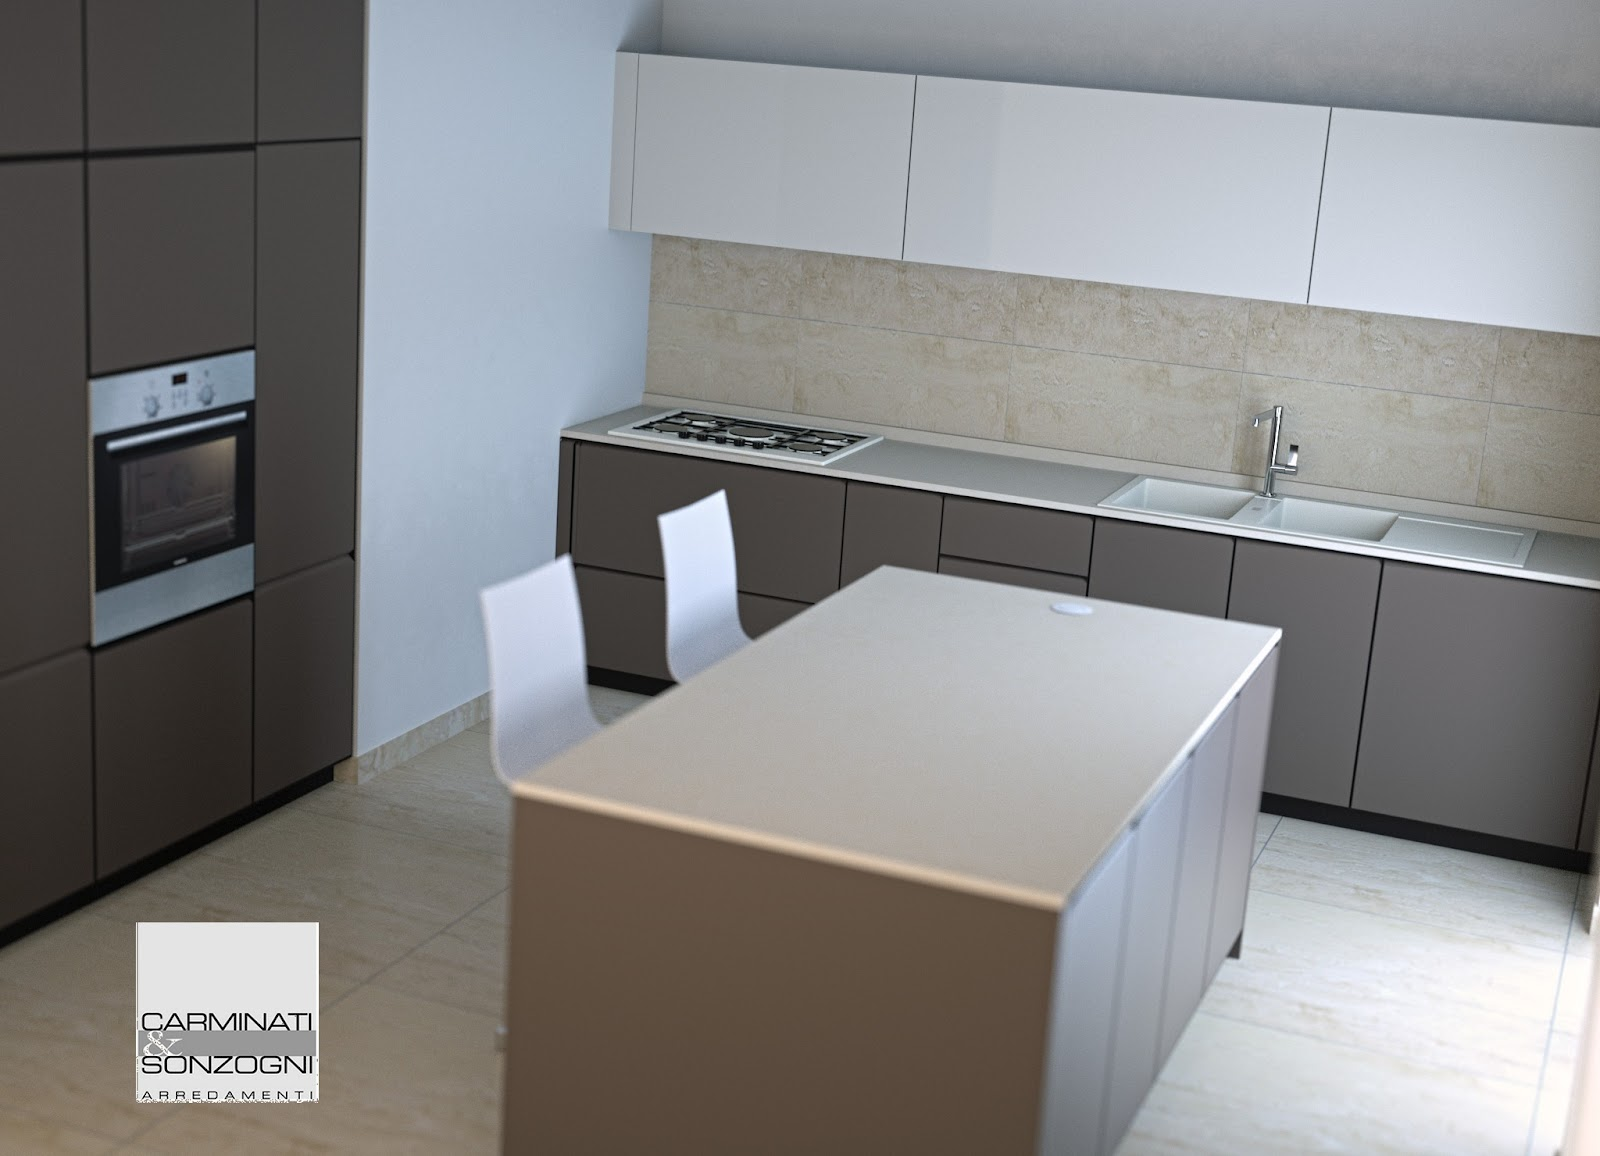 Stunning Linea Quattro Cucine Ideas - harrop.us - harrop.us